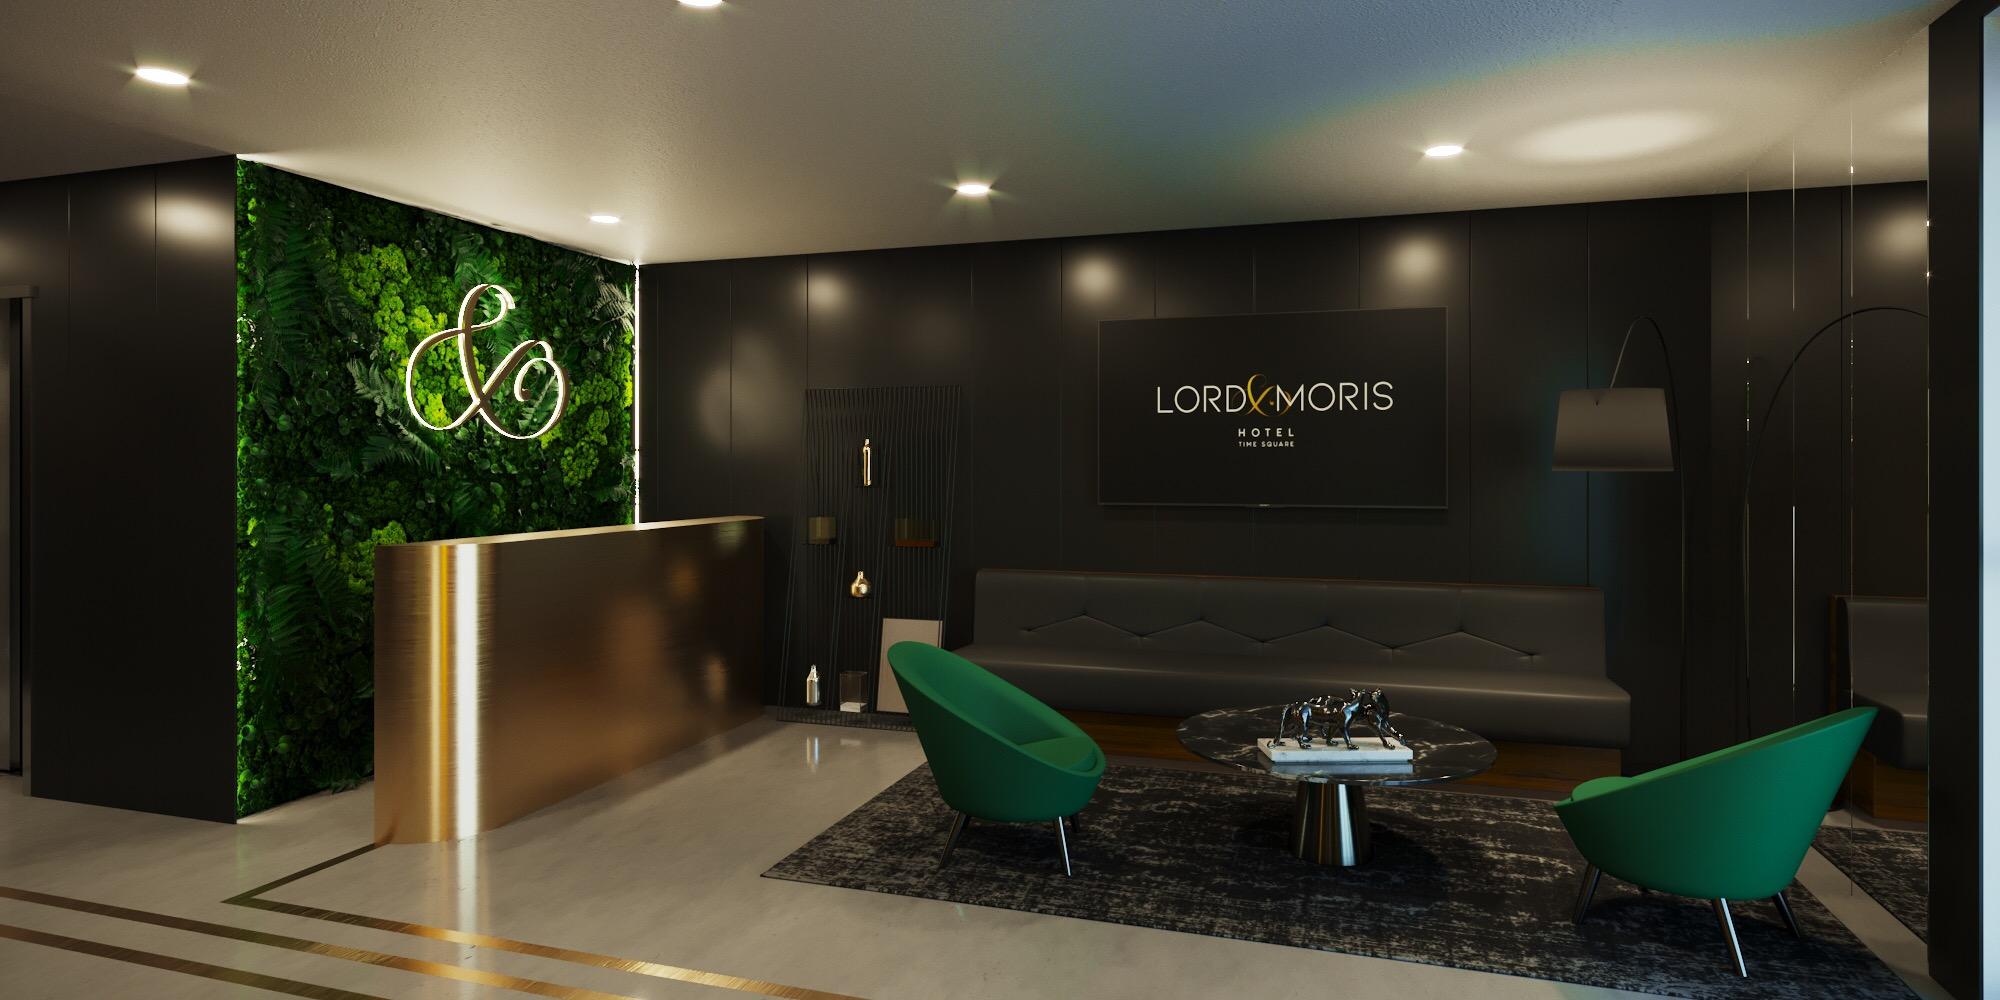 Lord & Moris Hotel